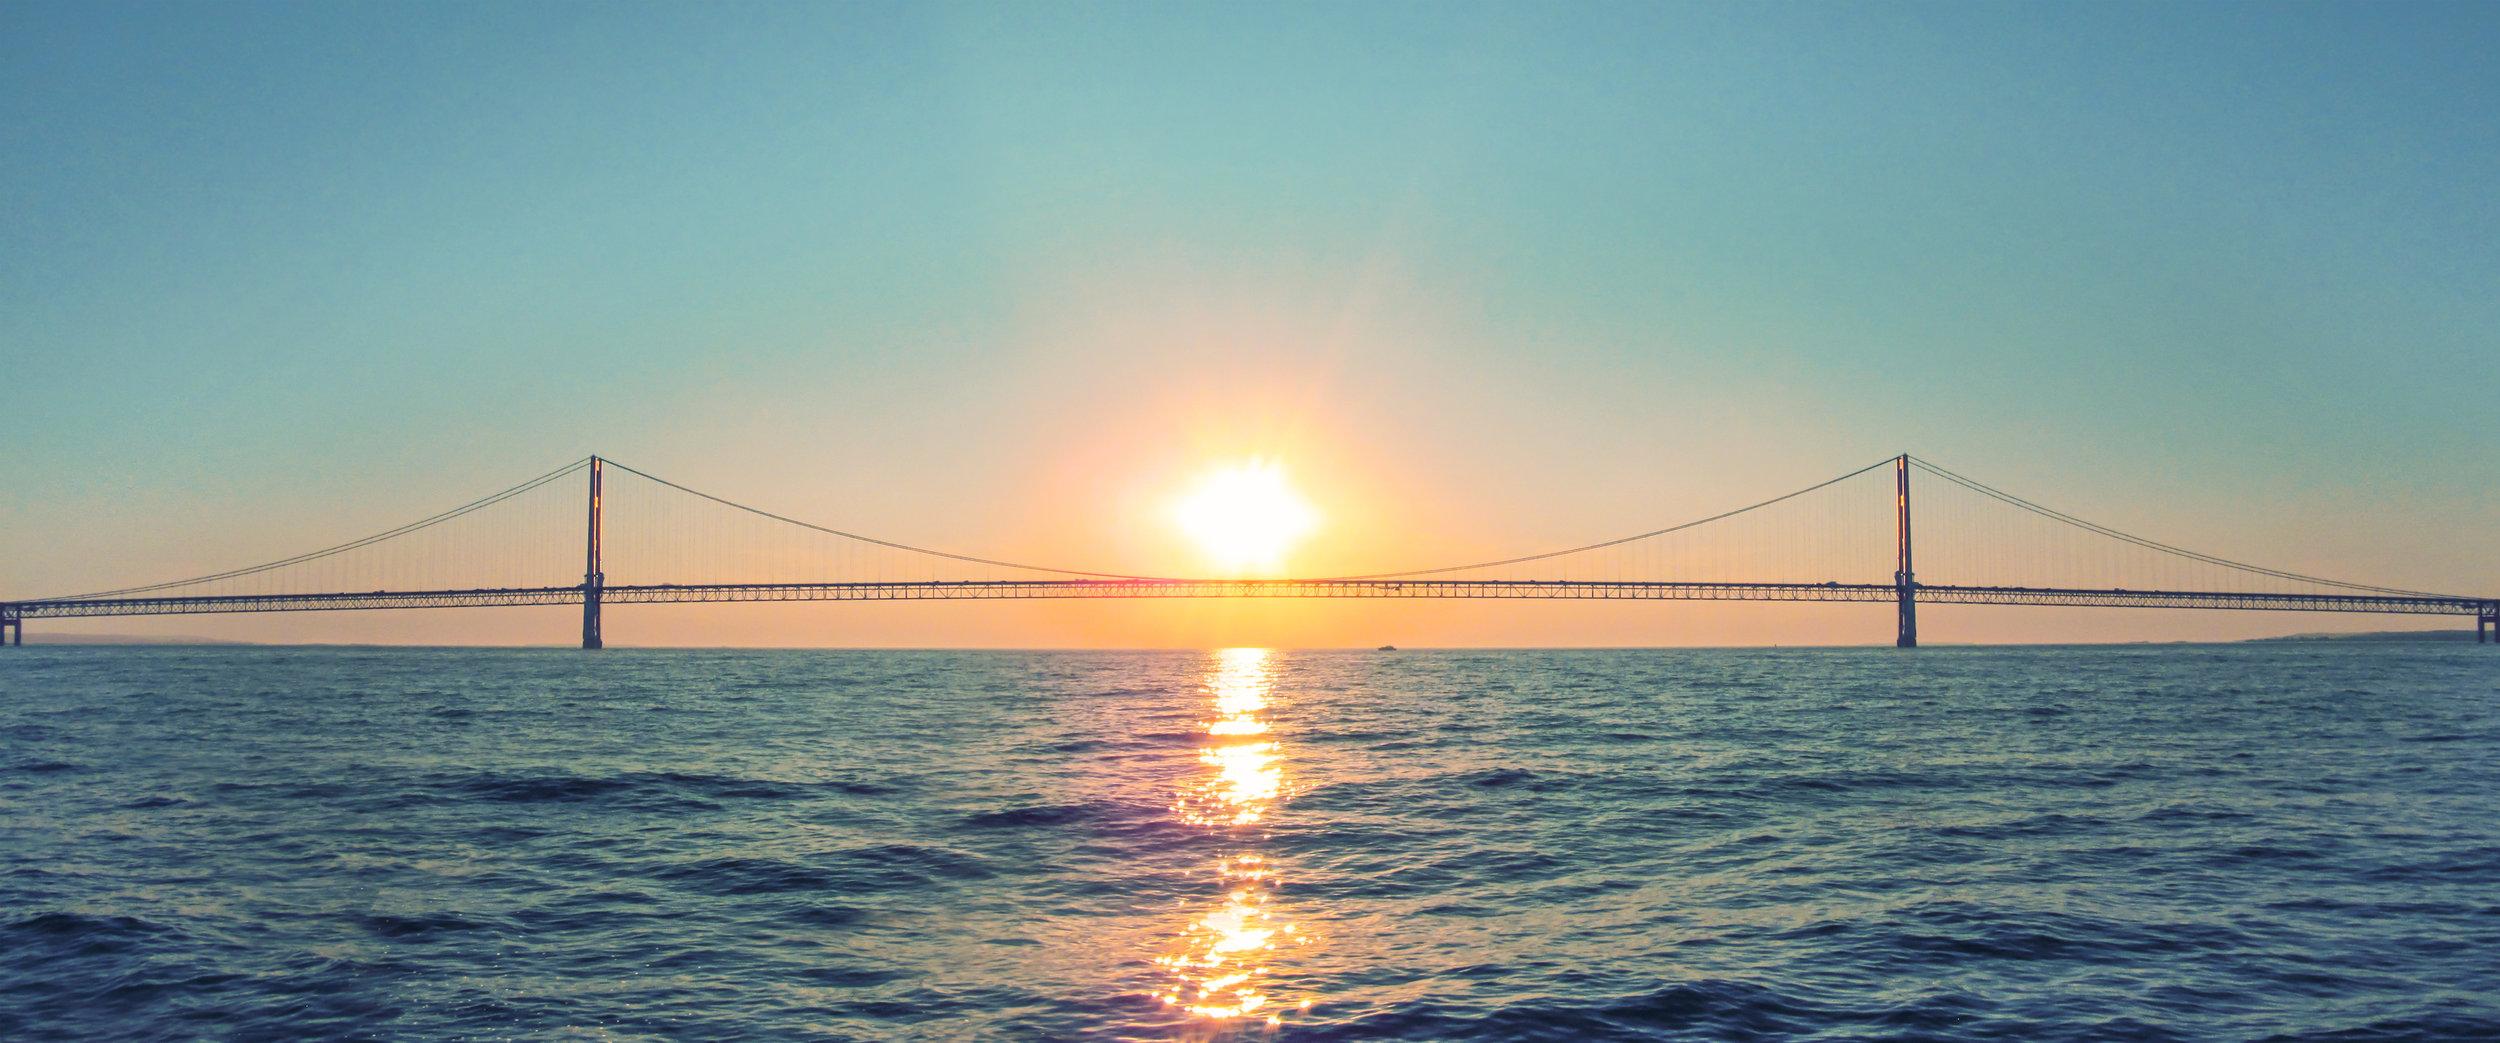 Pont + Soleil.jpg